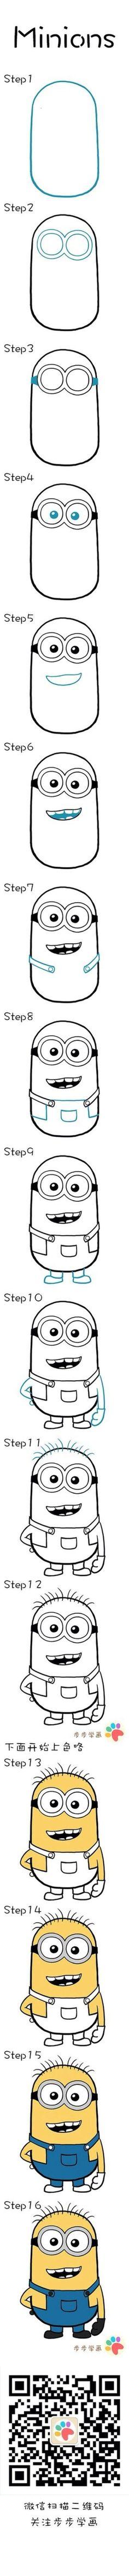 Image result for step by step doodles